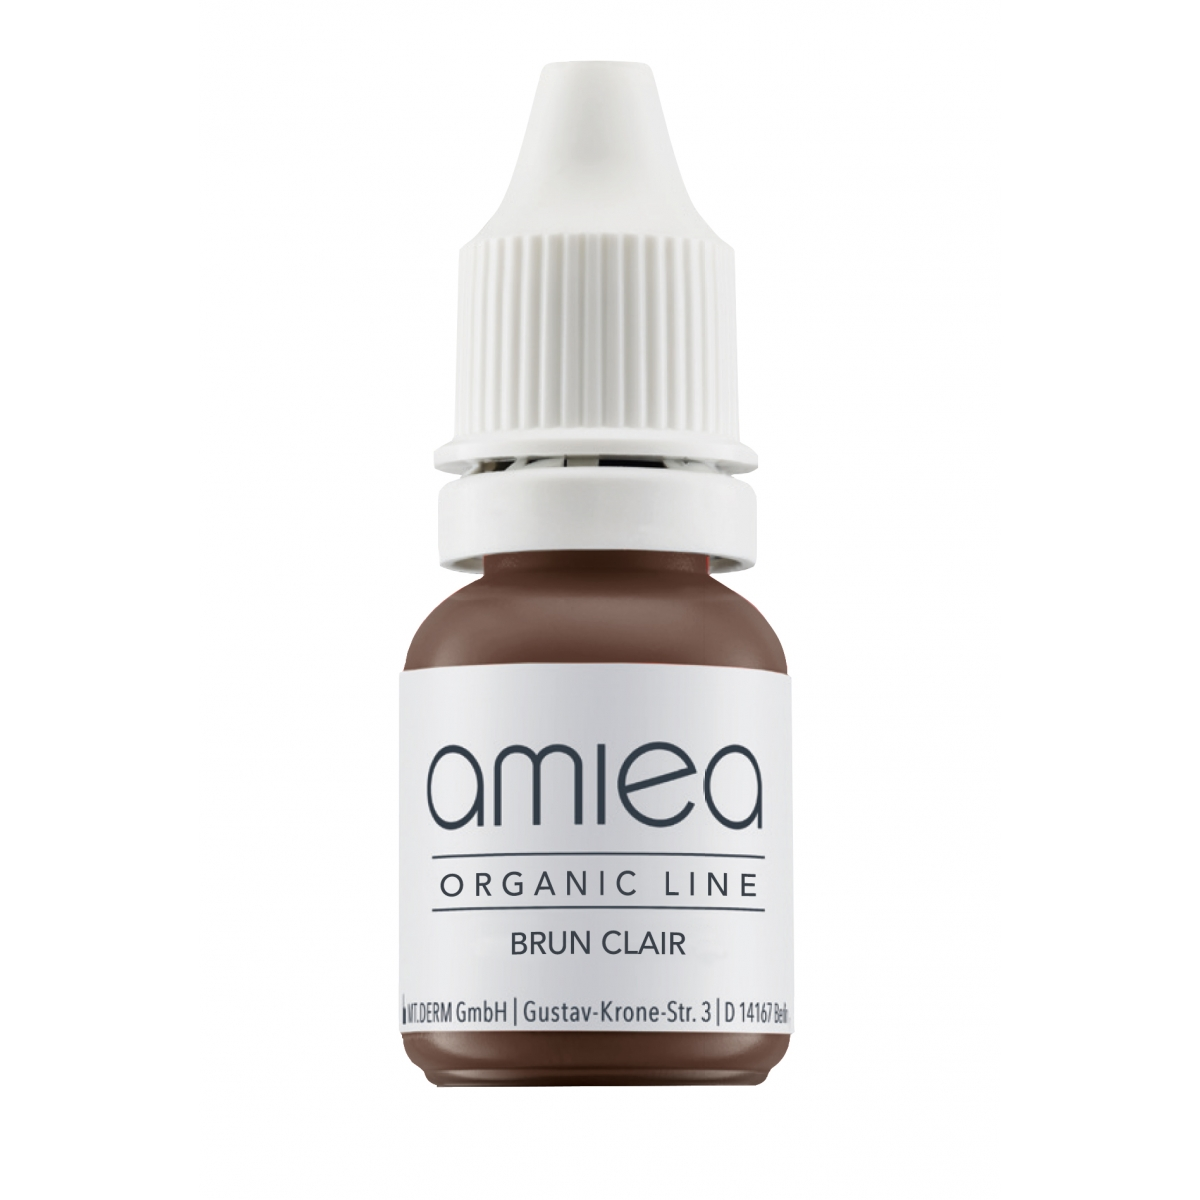 ORGANIC LINE (5ml)  - PIGMENT BRUN CLAIR ORGANICLINE AMIEA (5 ml)